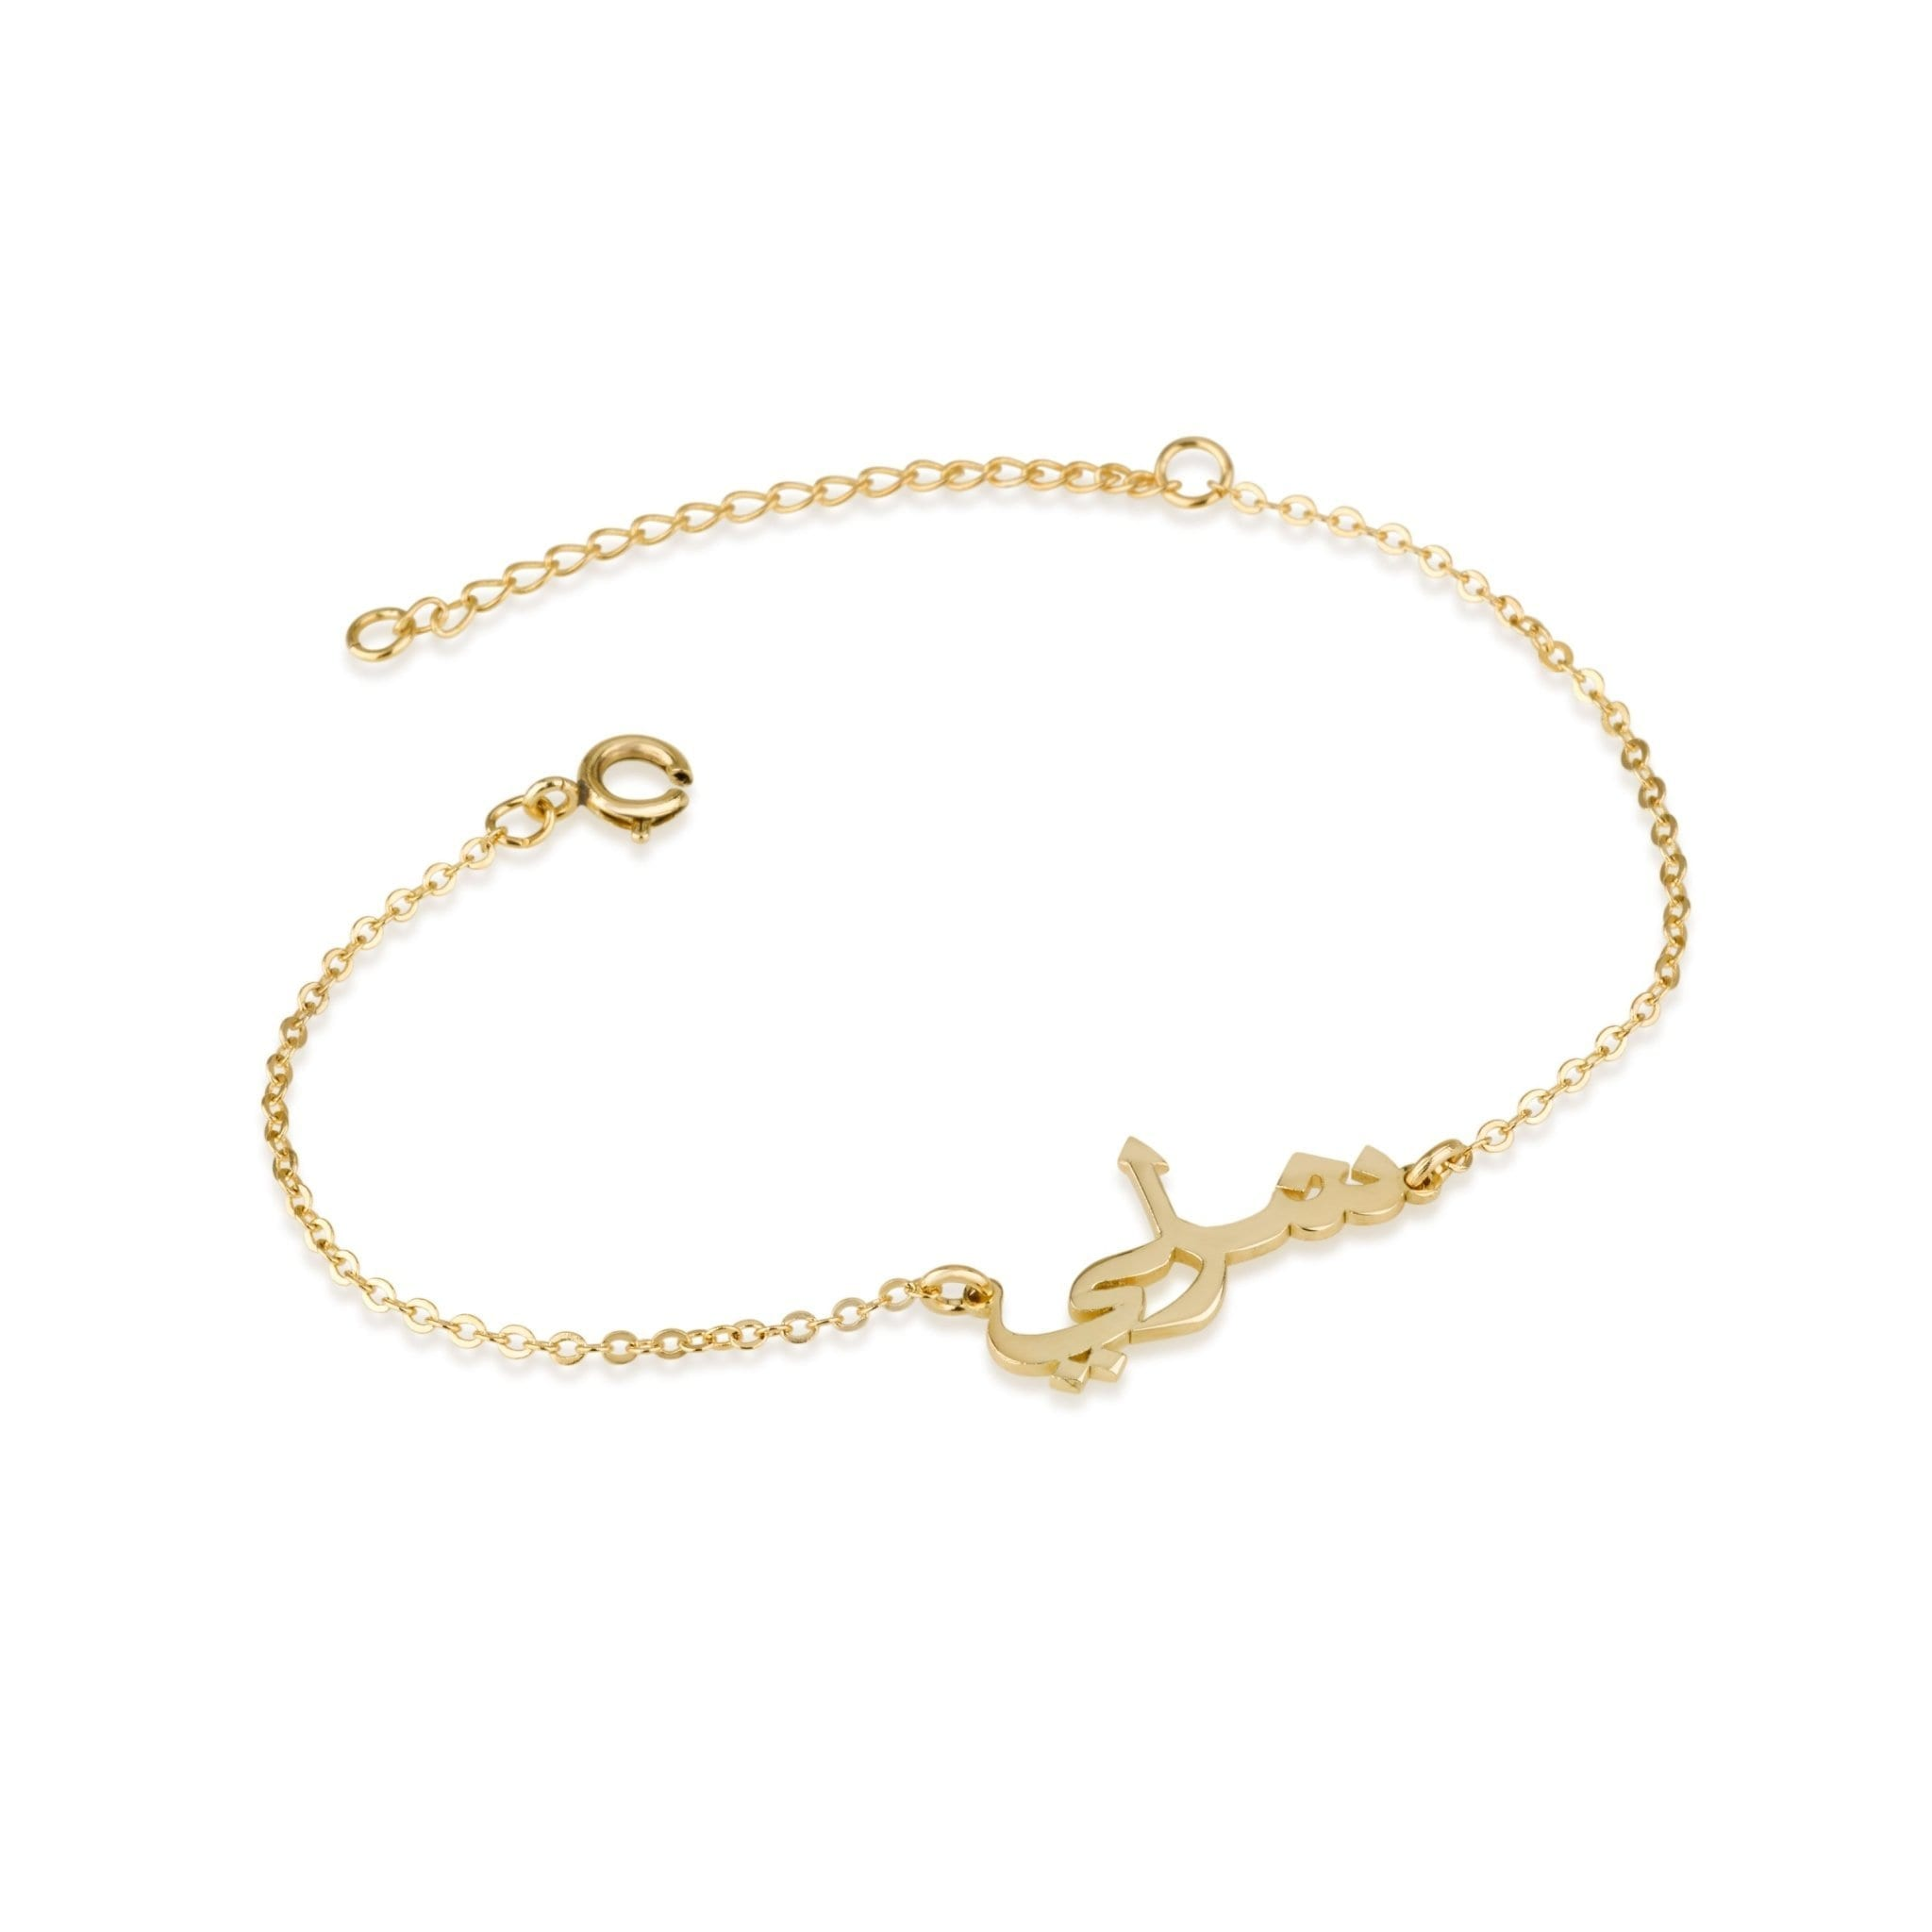 Custom Arabic Name Bracelet - Beleco Jewelry